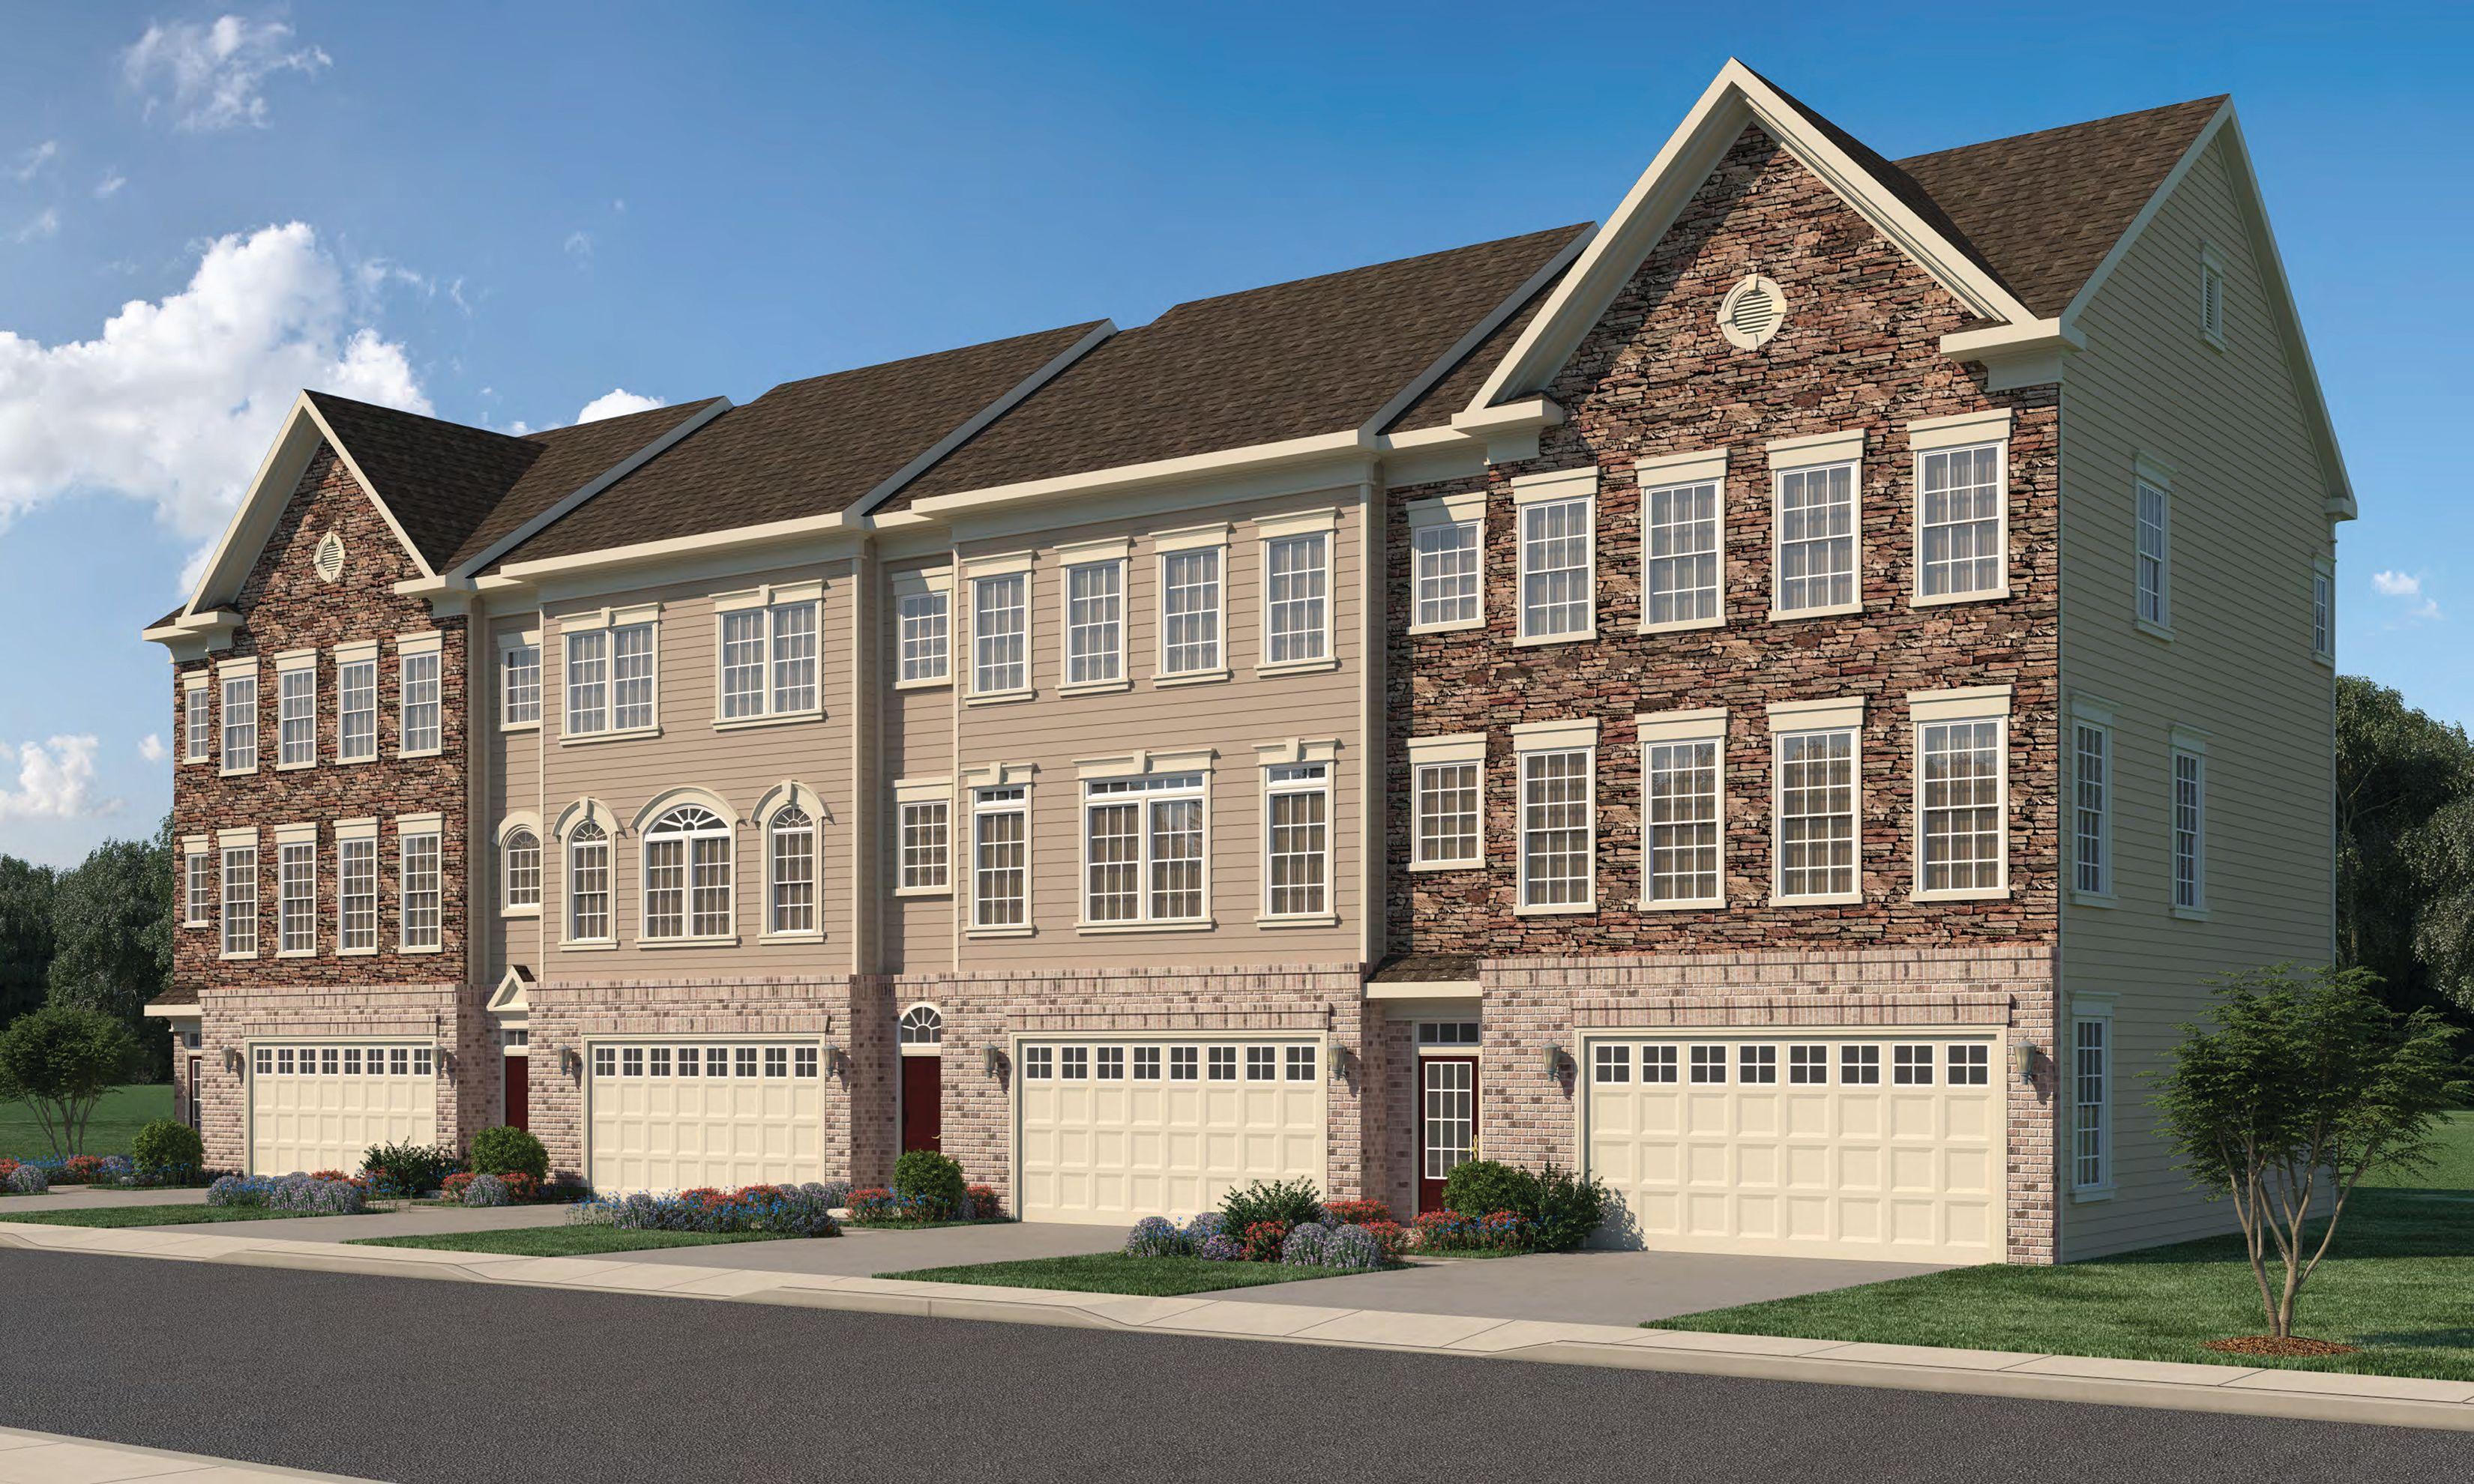 New condos in bear de newhomesource for Blenheim builders